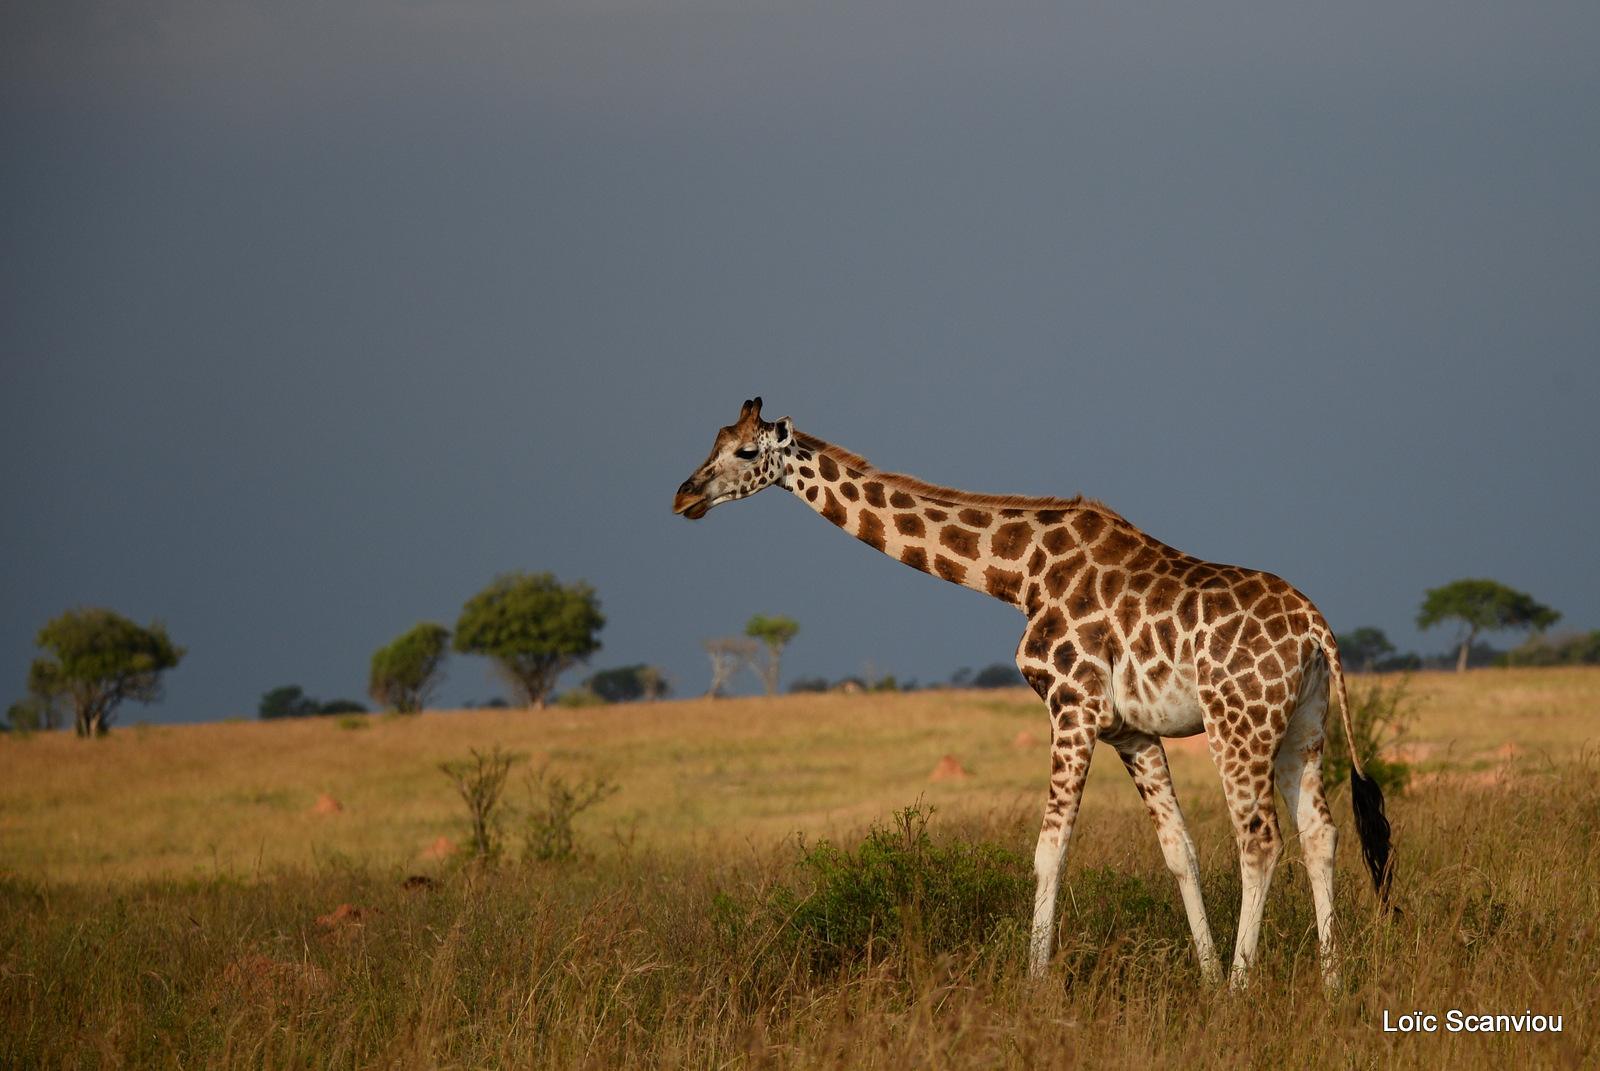 Girafe de Rothschild/Rothschild's Giraffe (14)